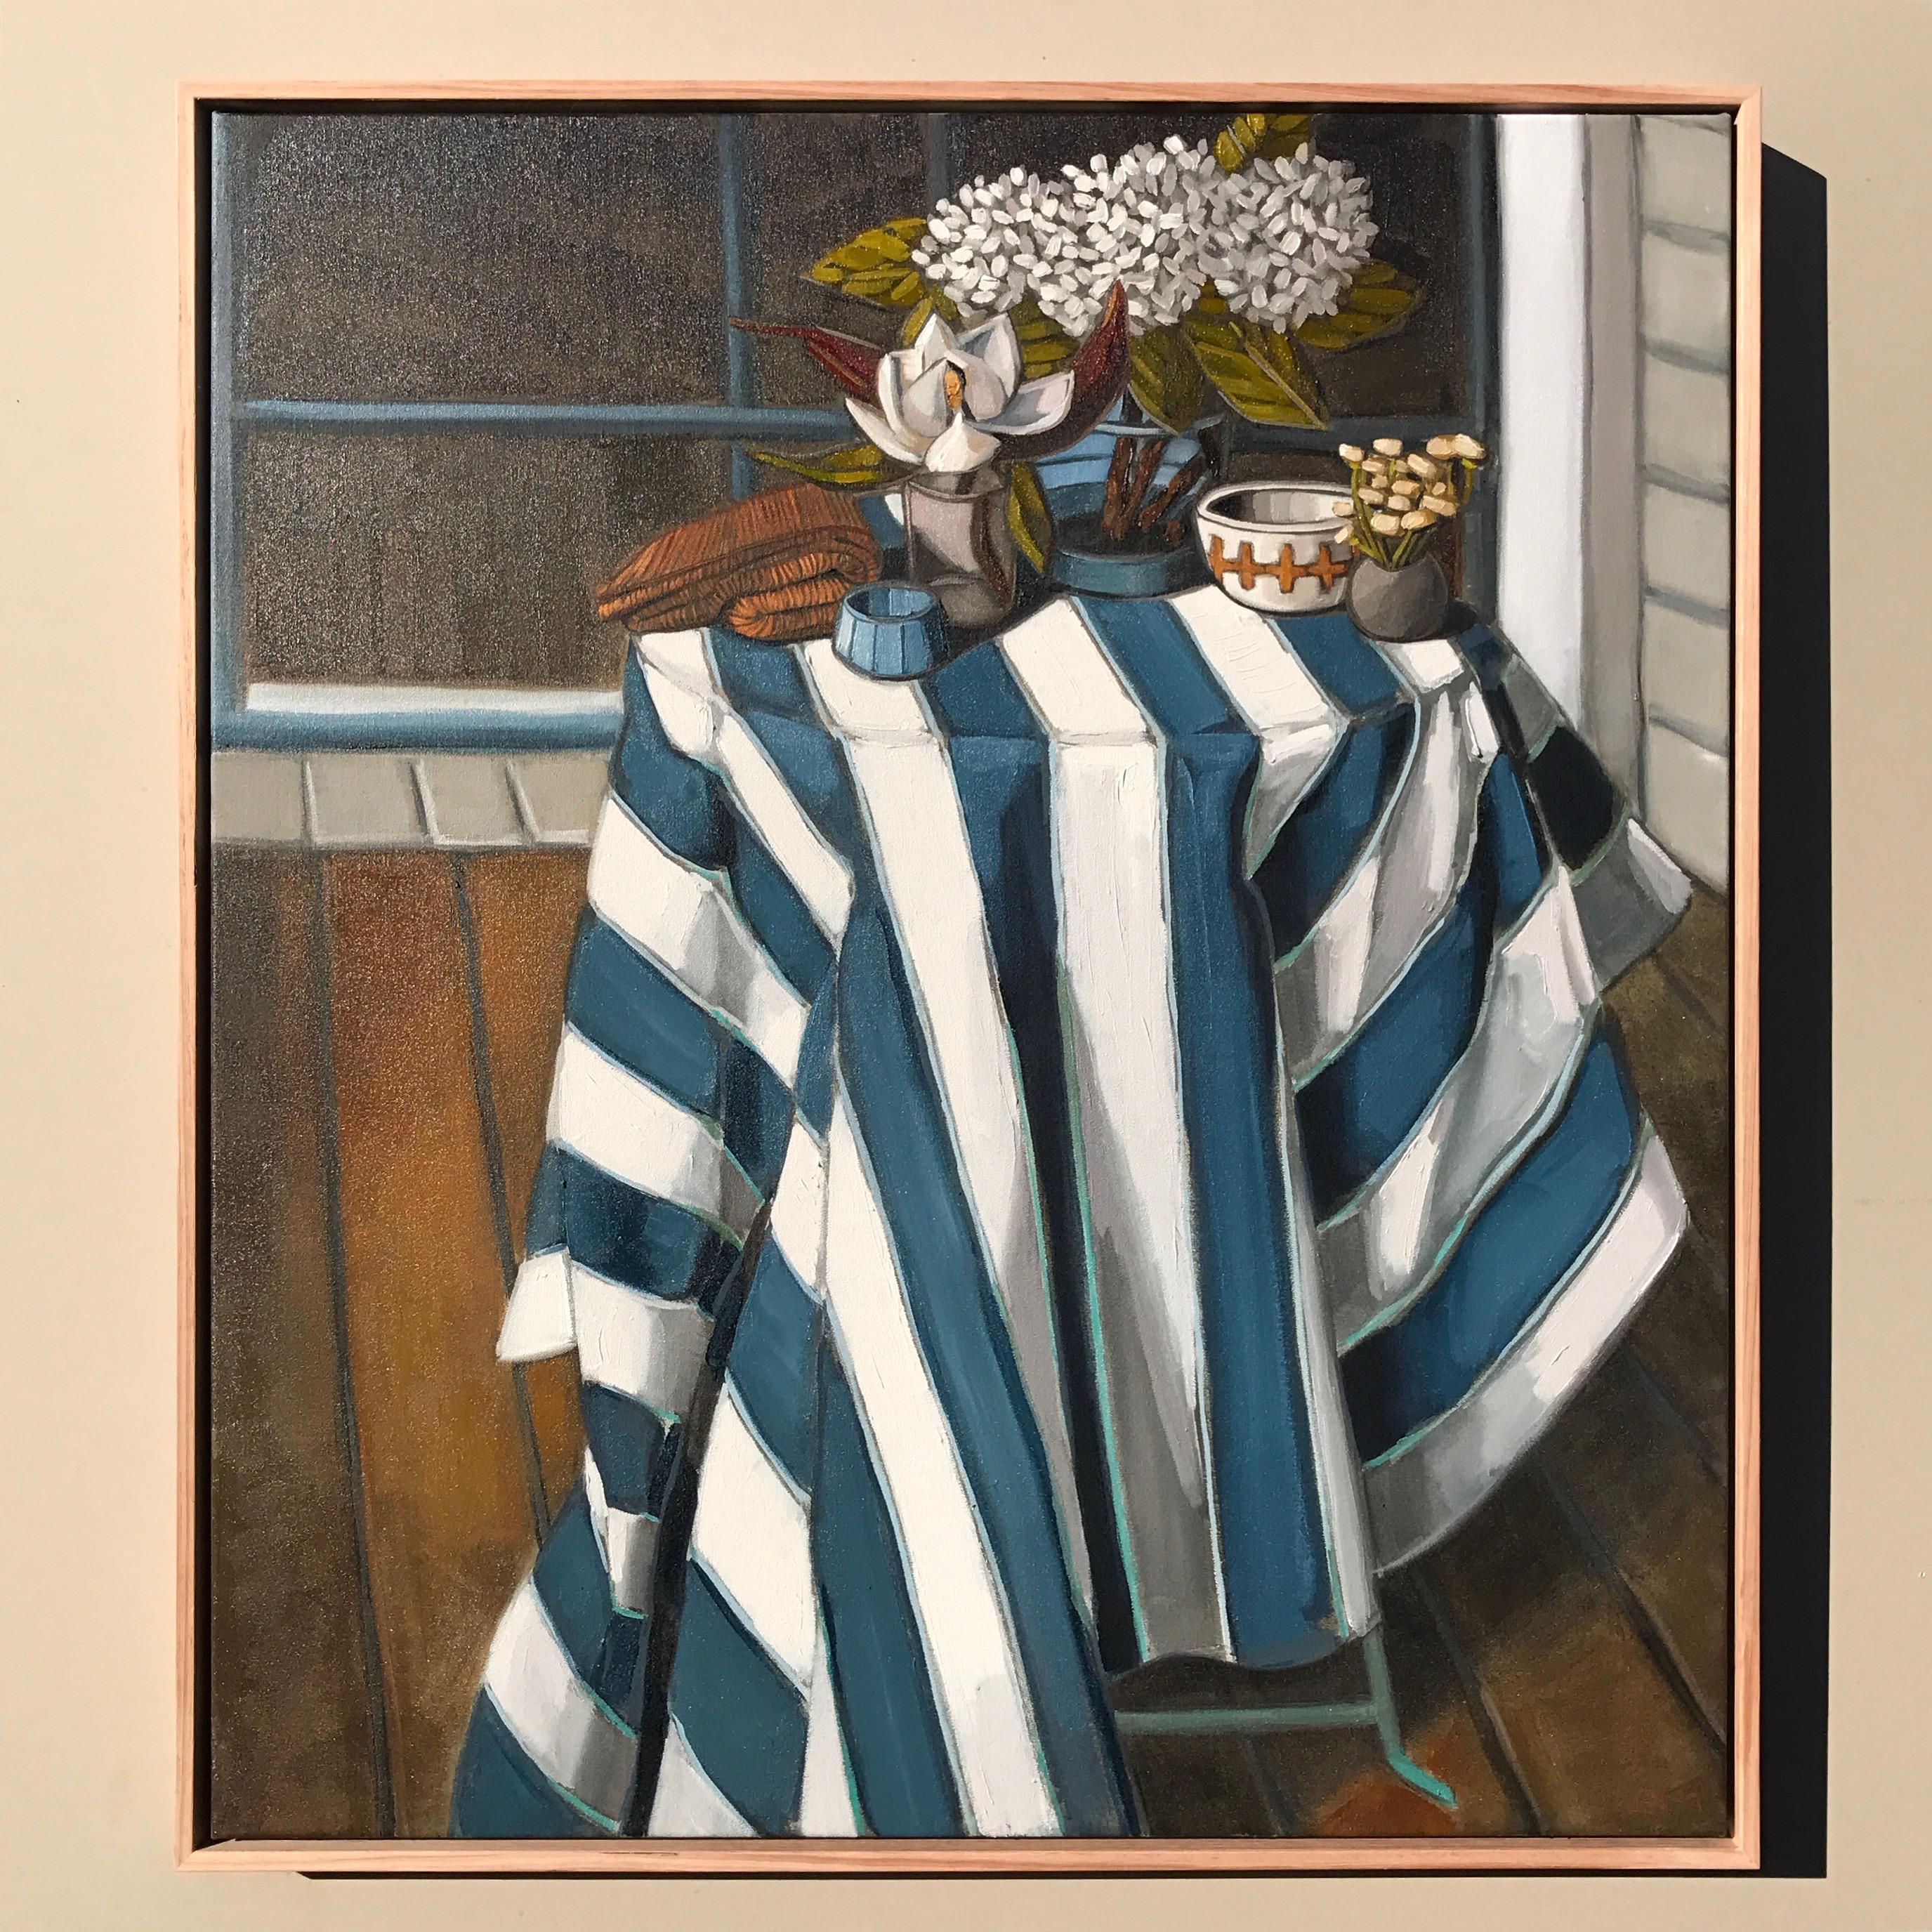 04_17 Still Life, Hydrangeas & Stripes 88cmx78cm $1,995